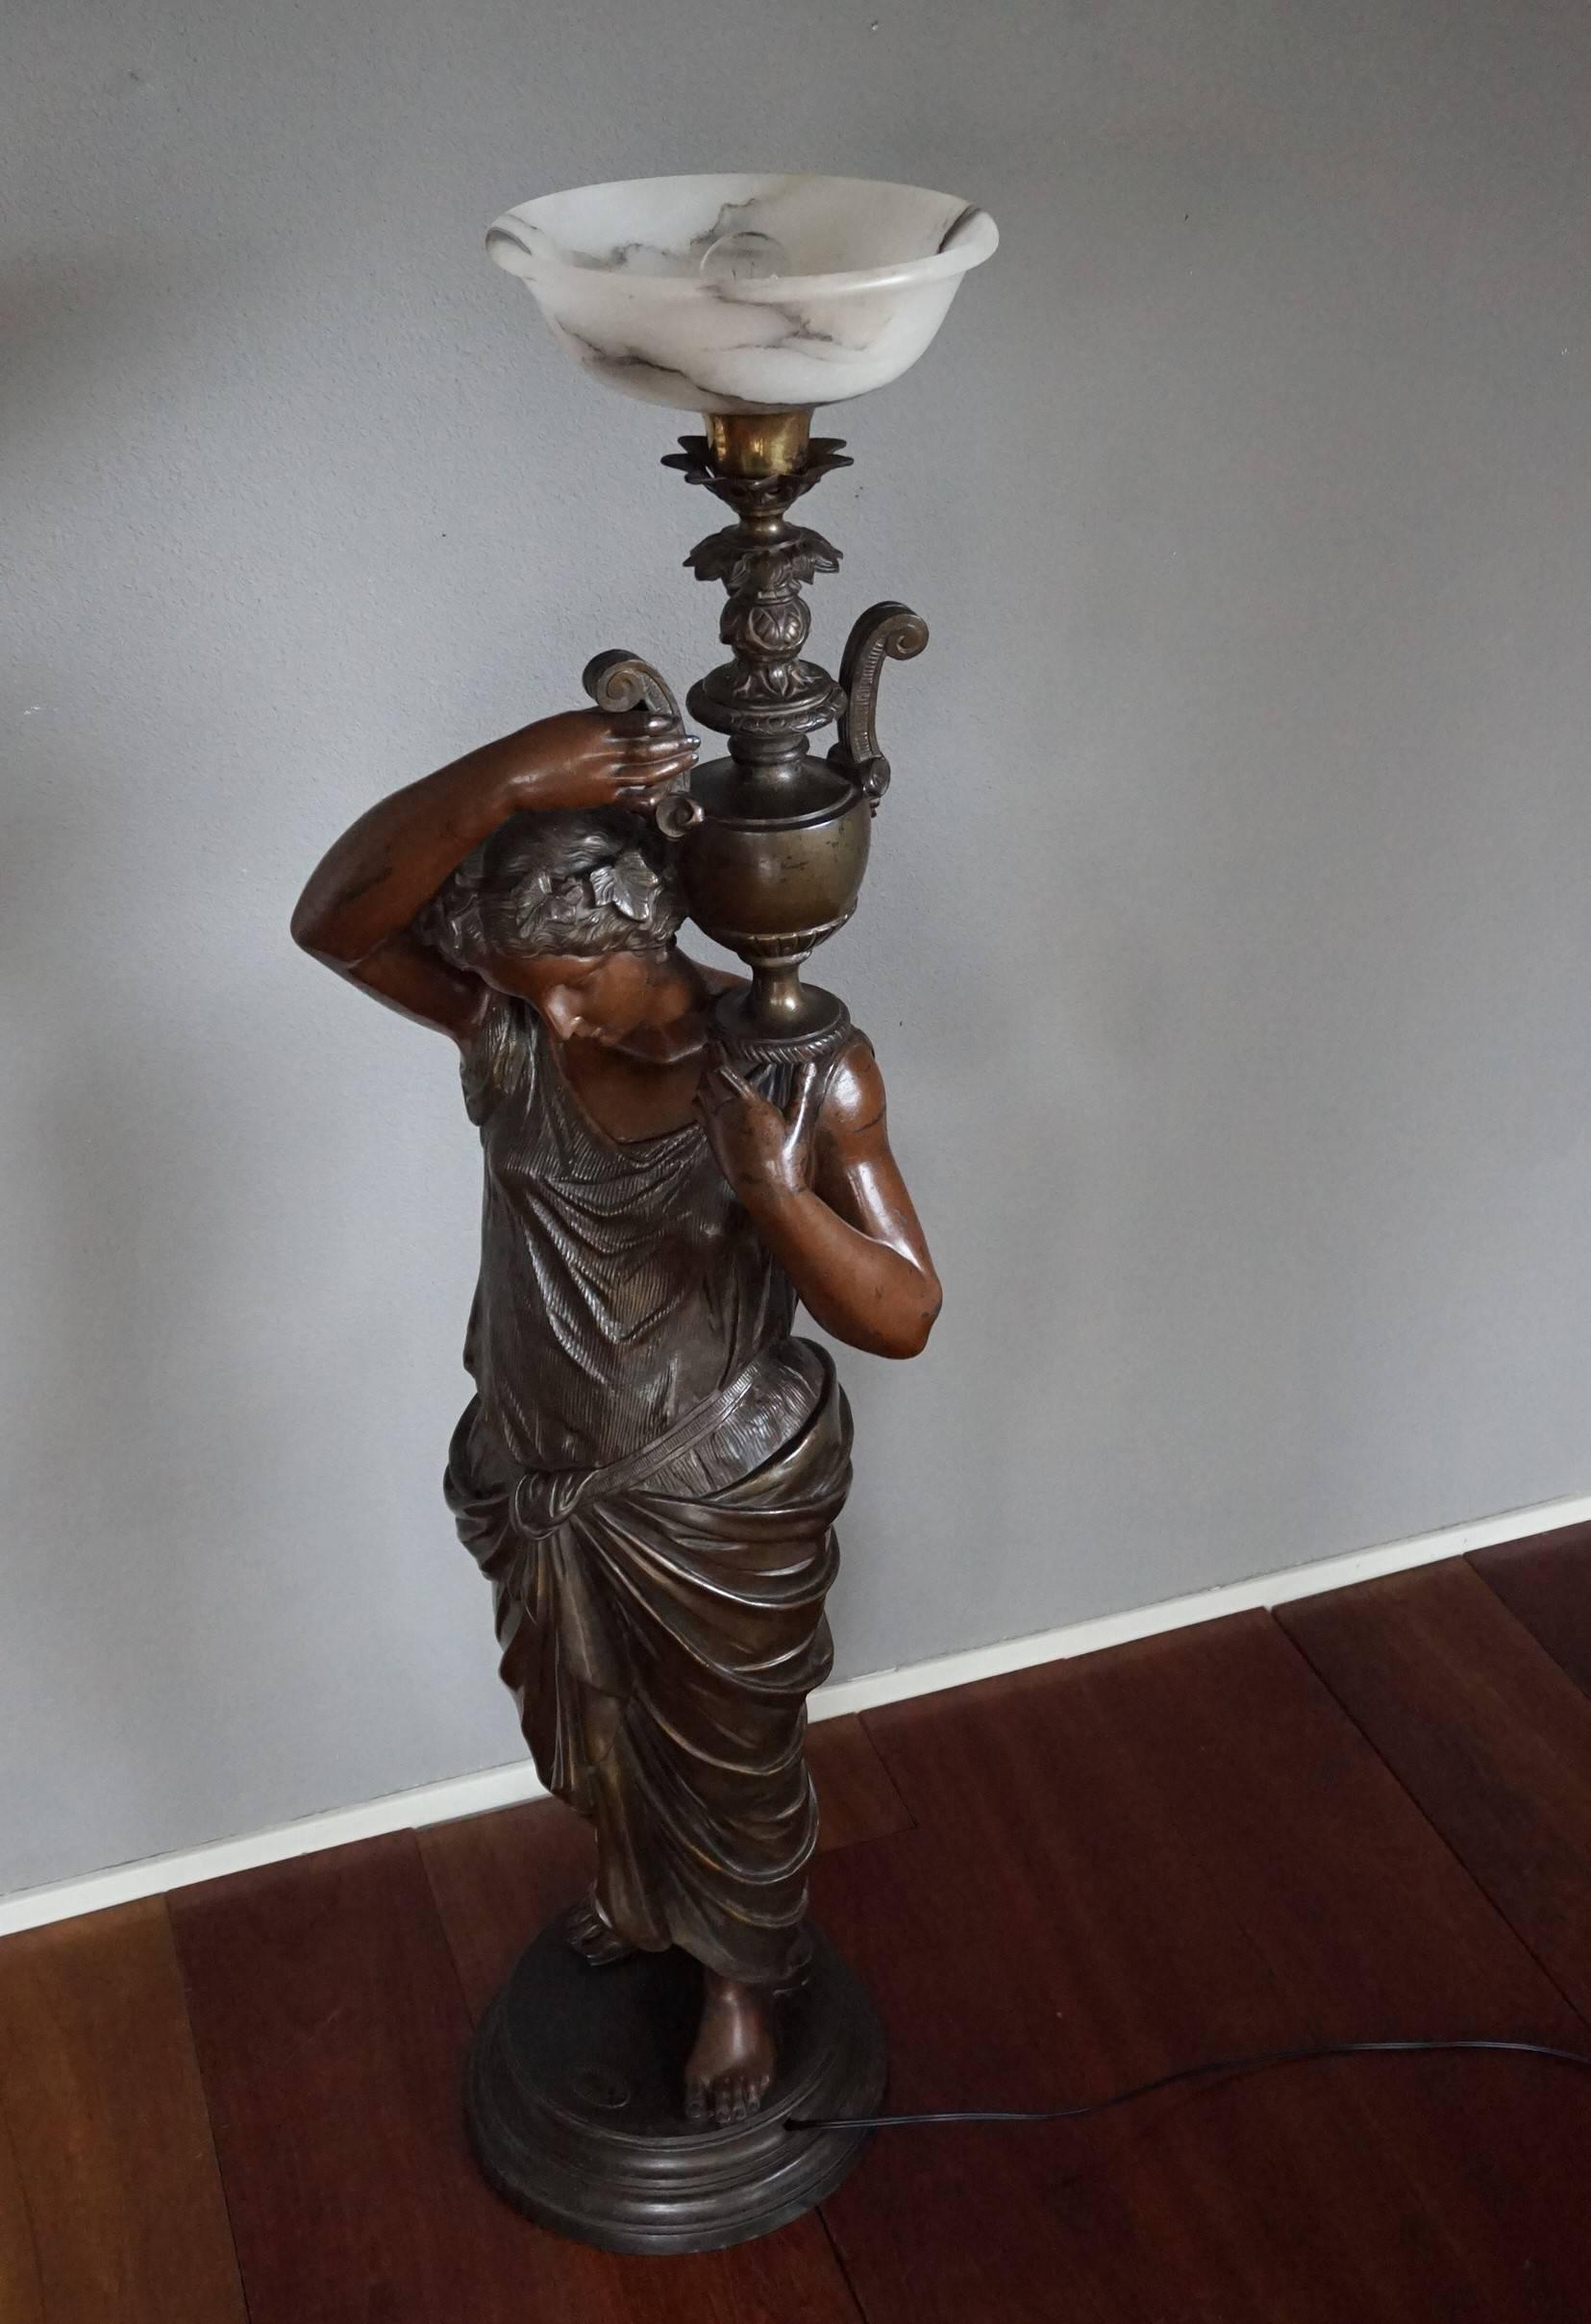 thor statue of od wonderfull lighting statues uppsala gods frey from floor odin lamp awesome unique world